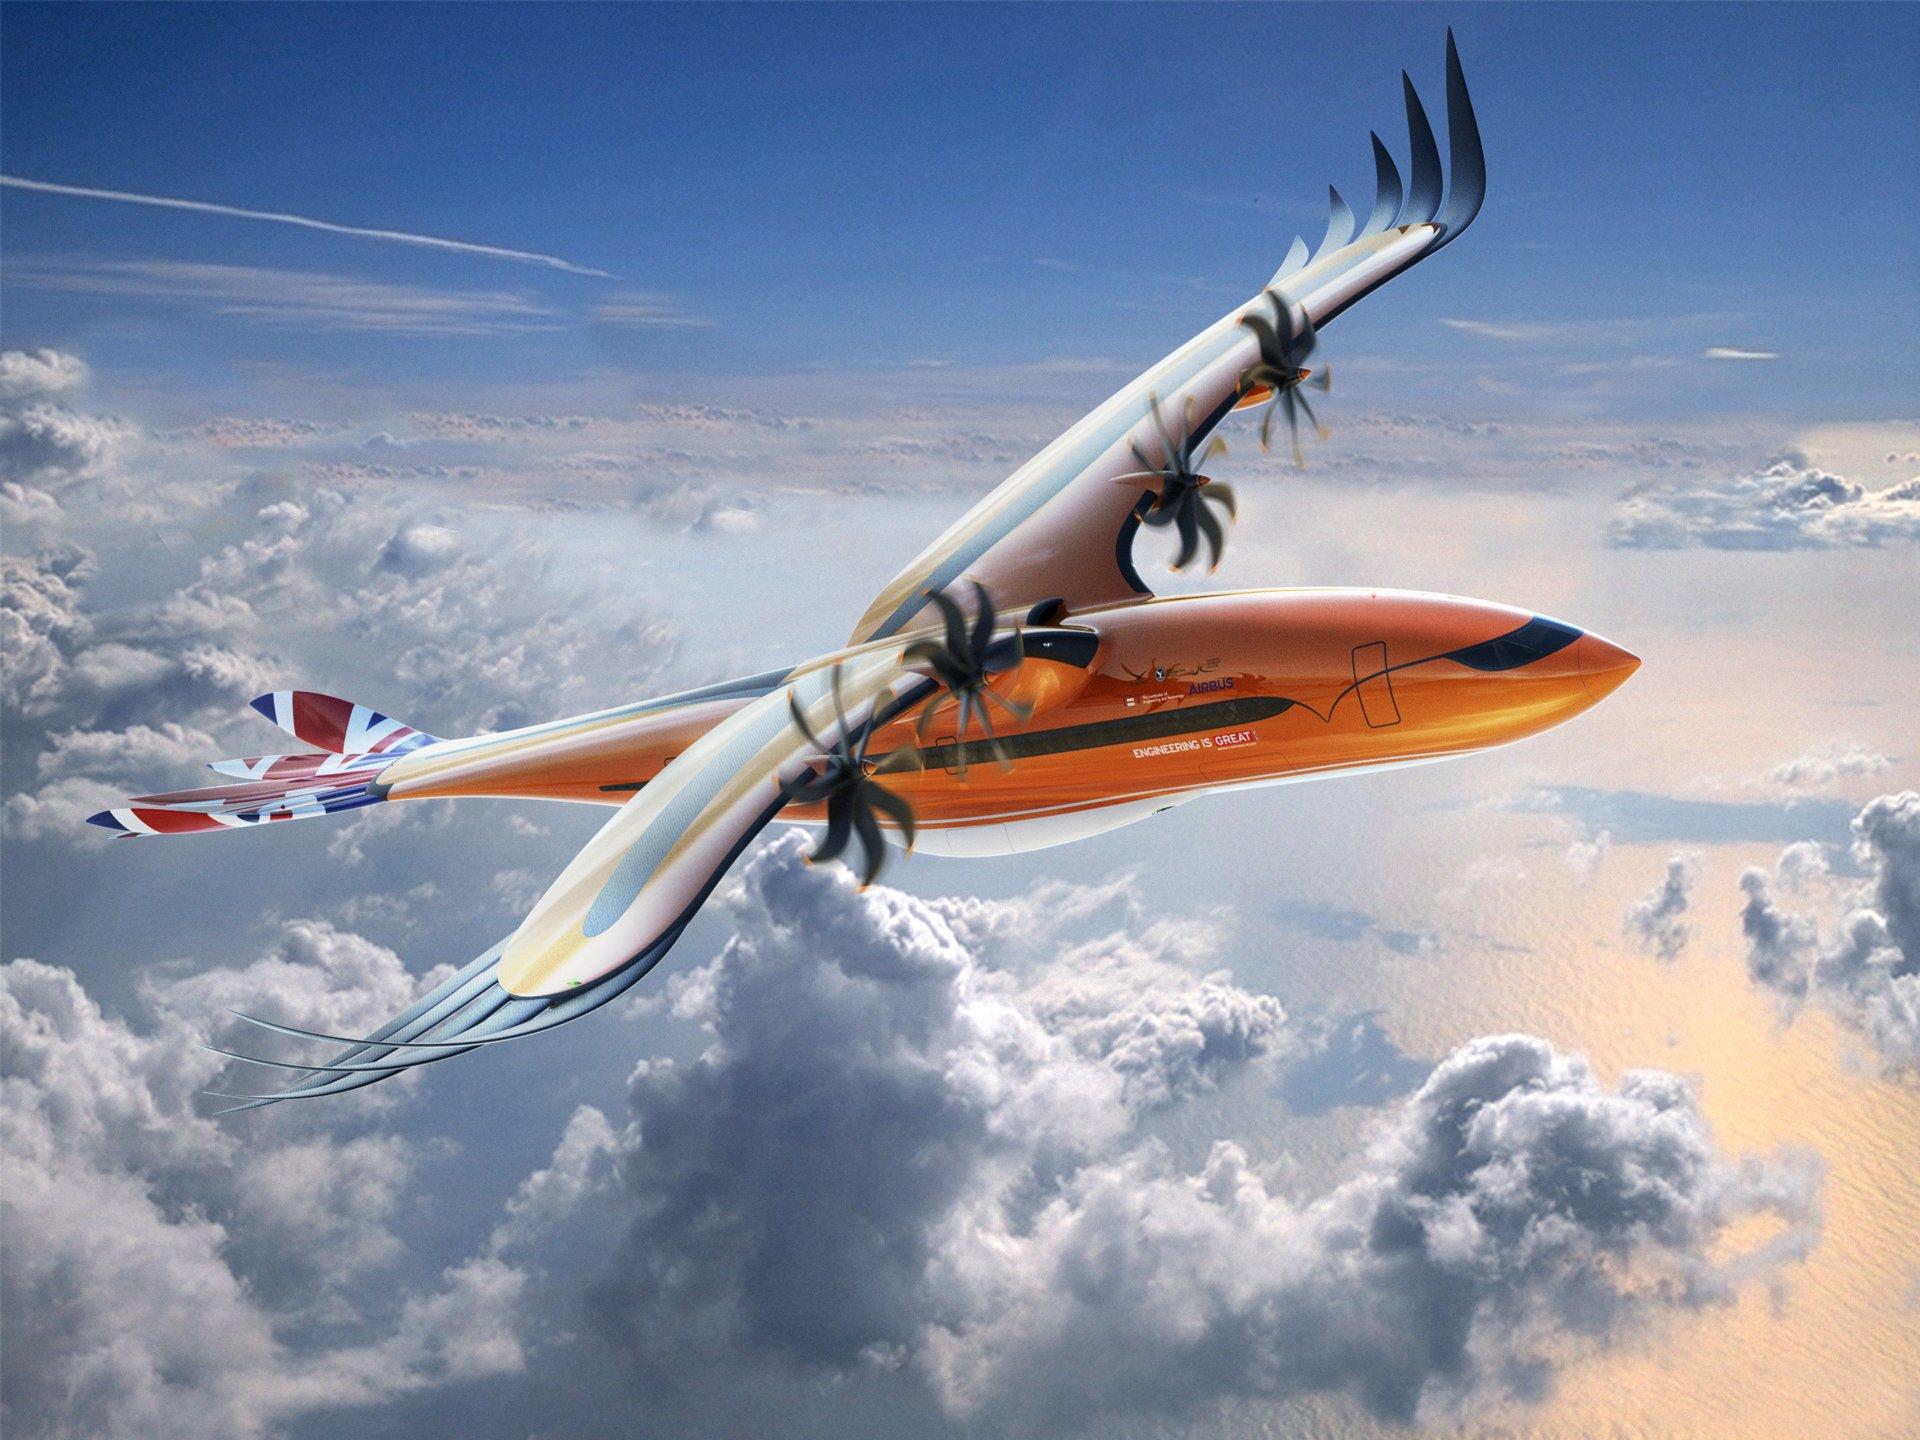 L'avion eyldarin, vu par des Terriens